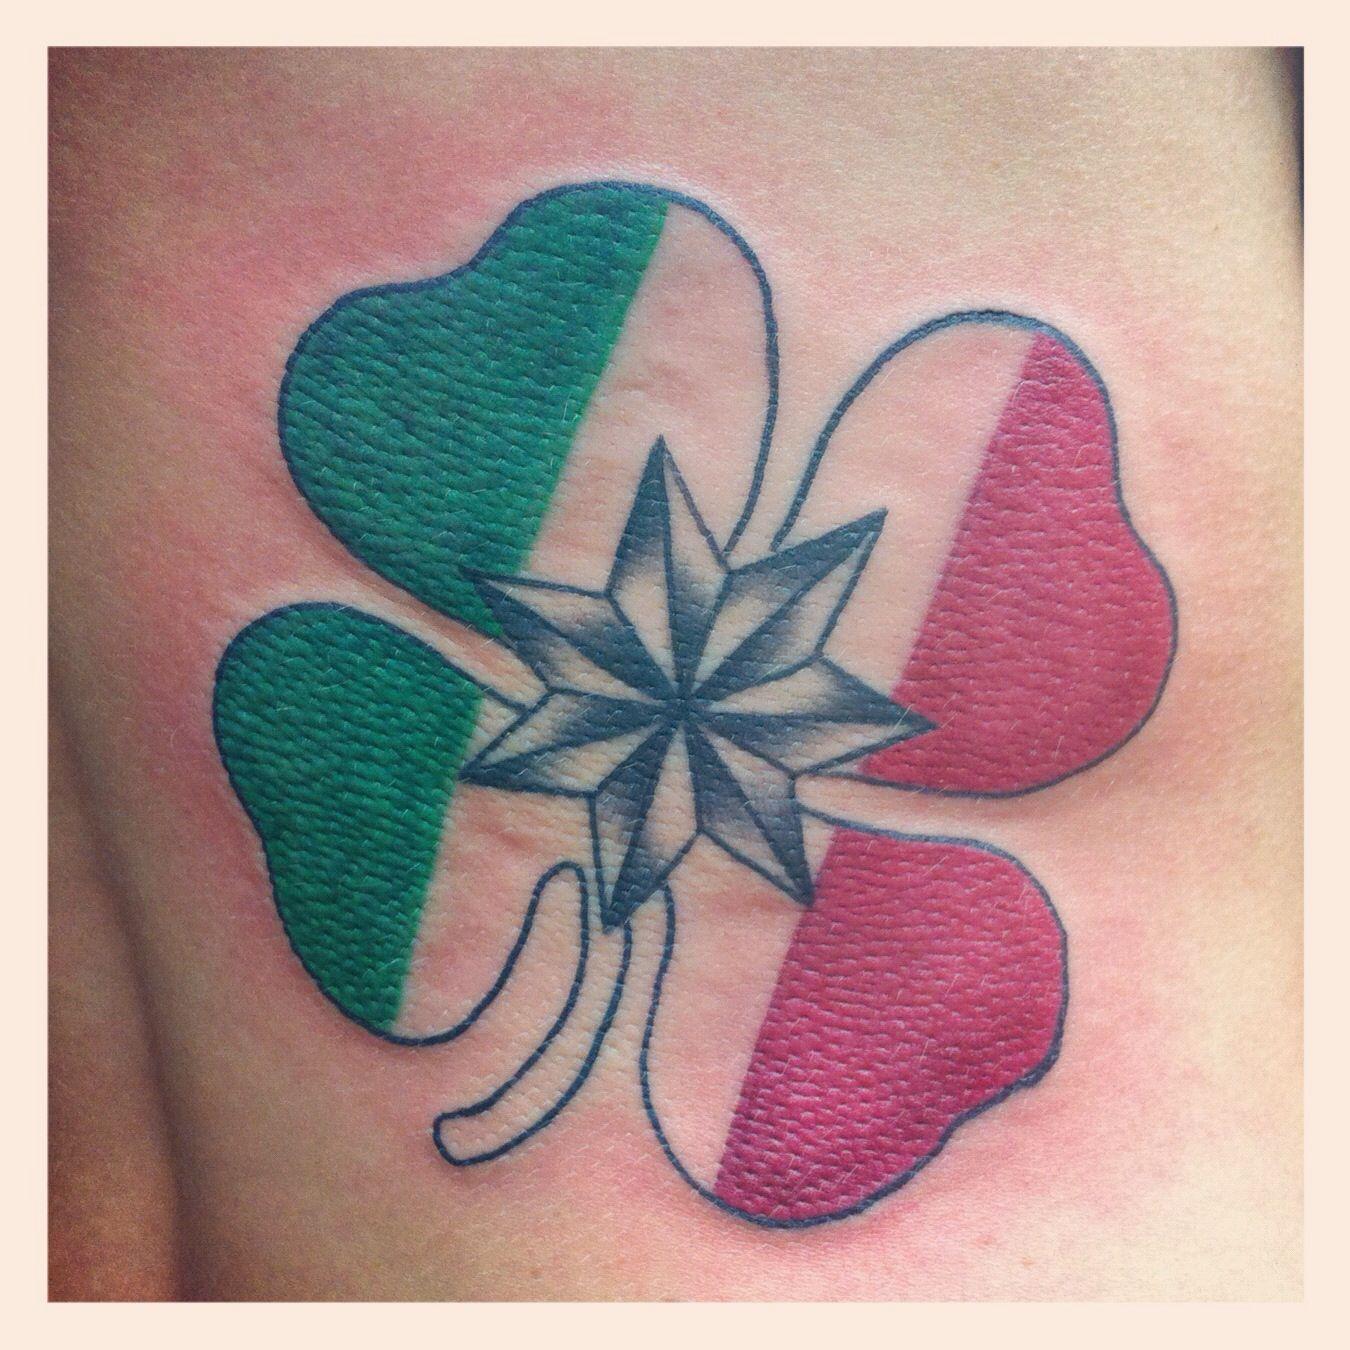 Italian Irish And Native American Family Symbol Tattoos I Have